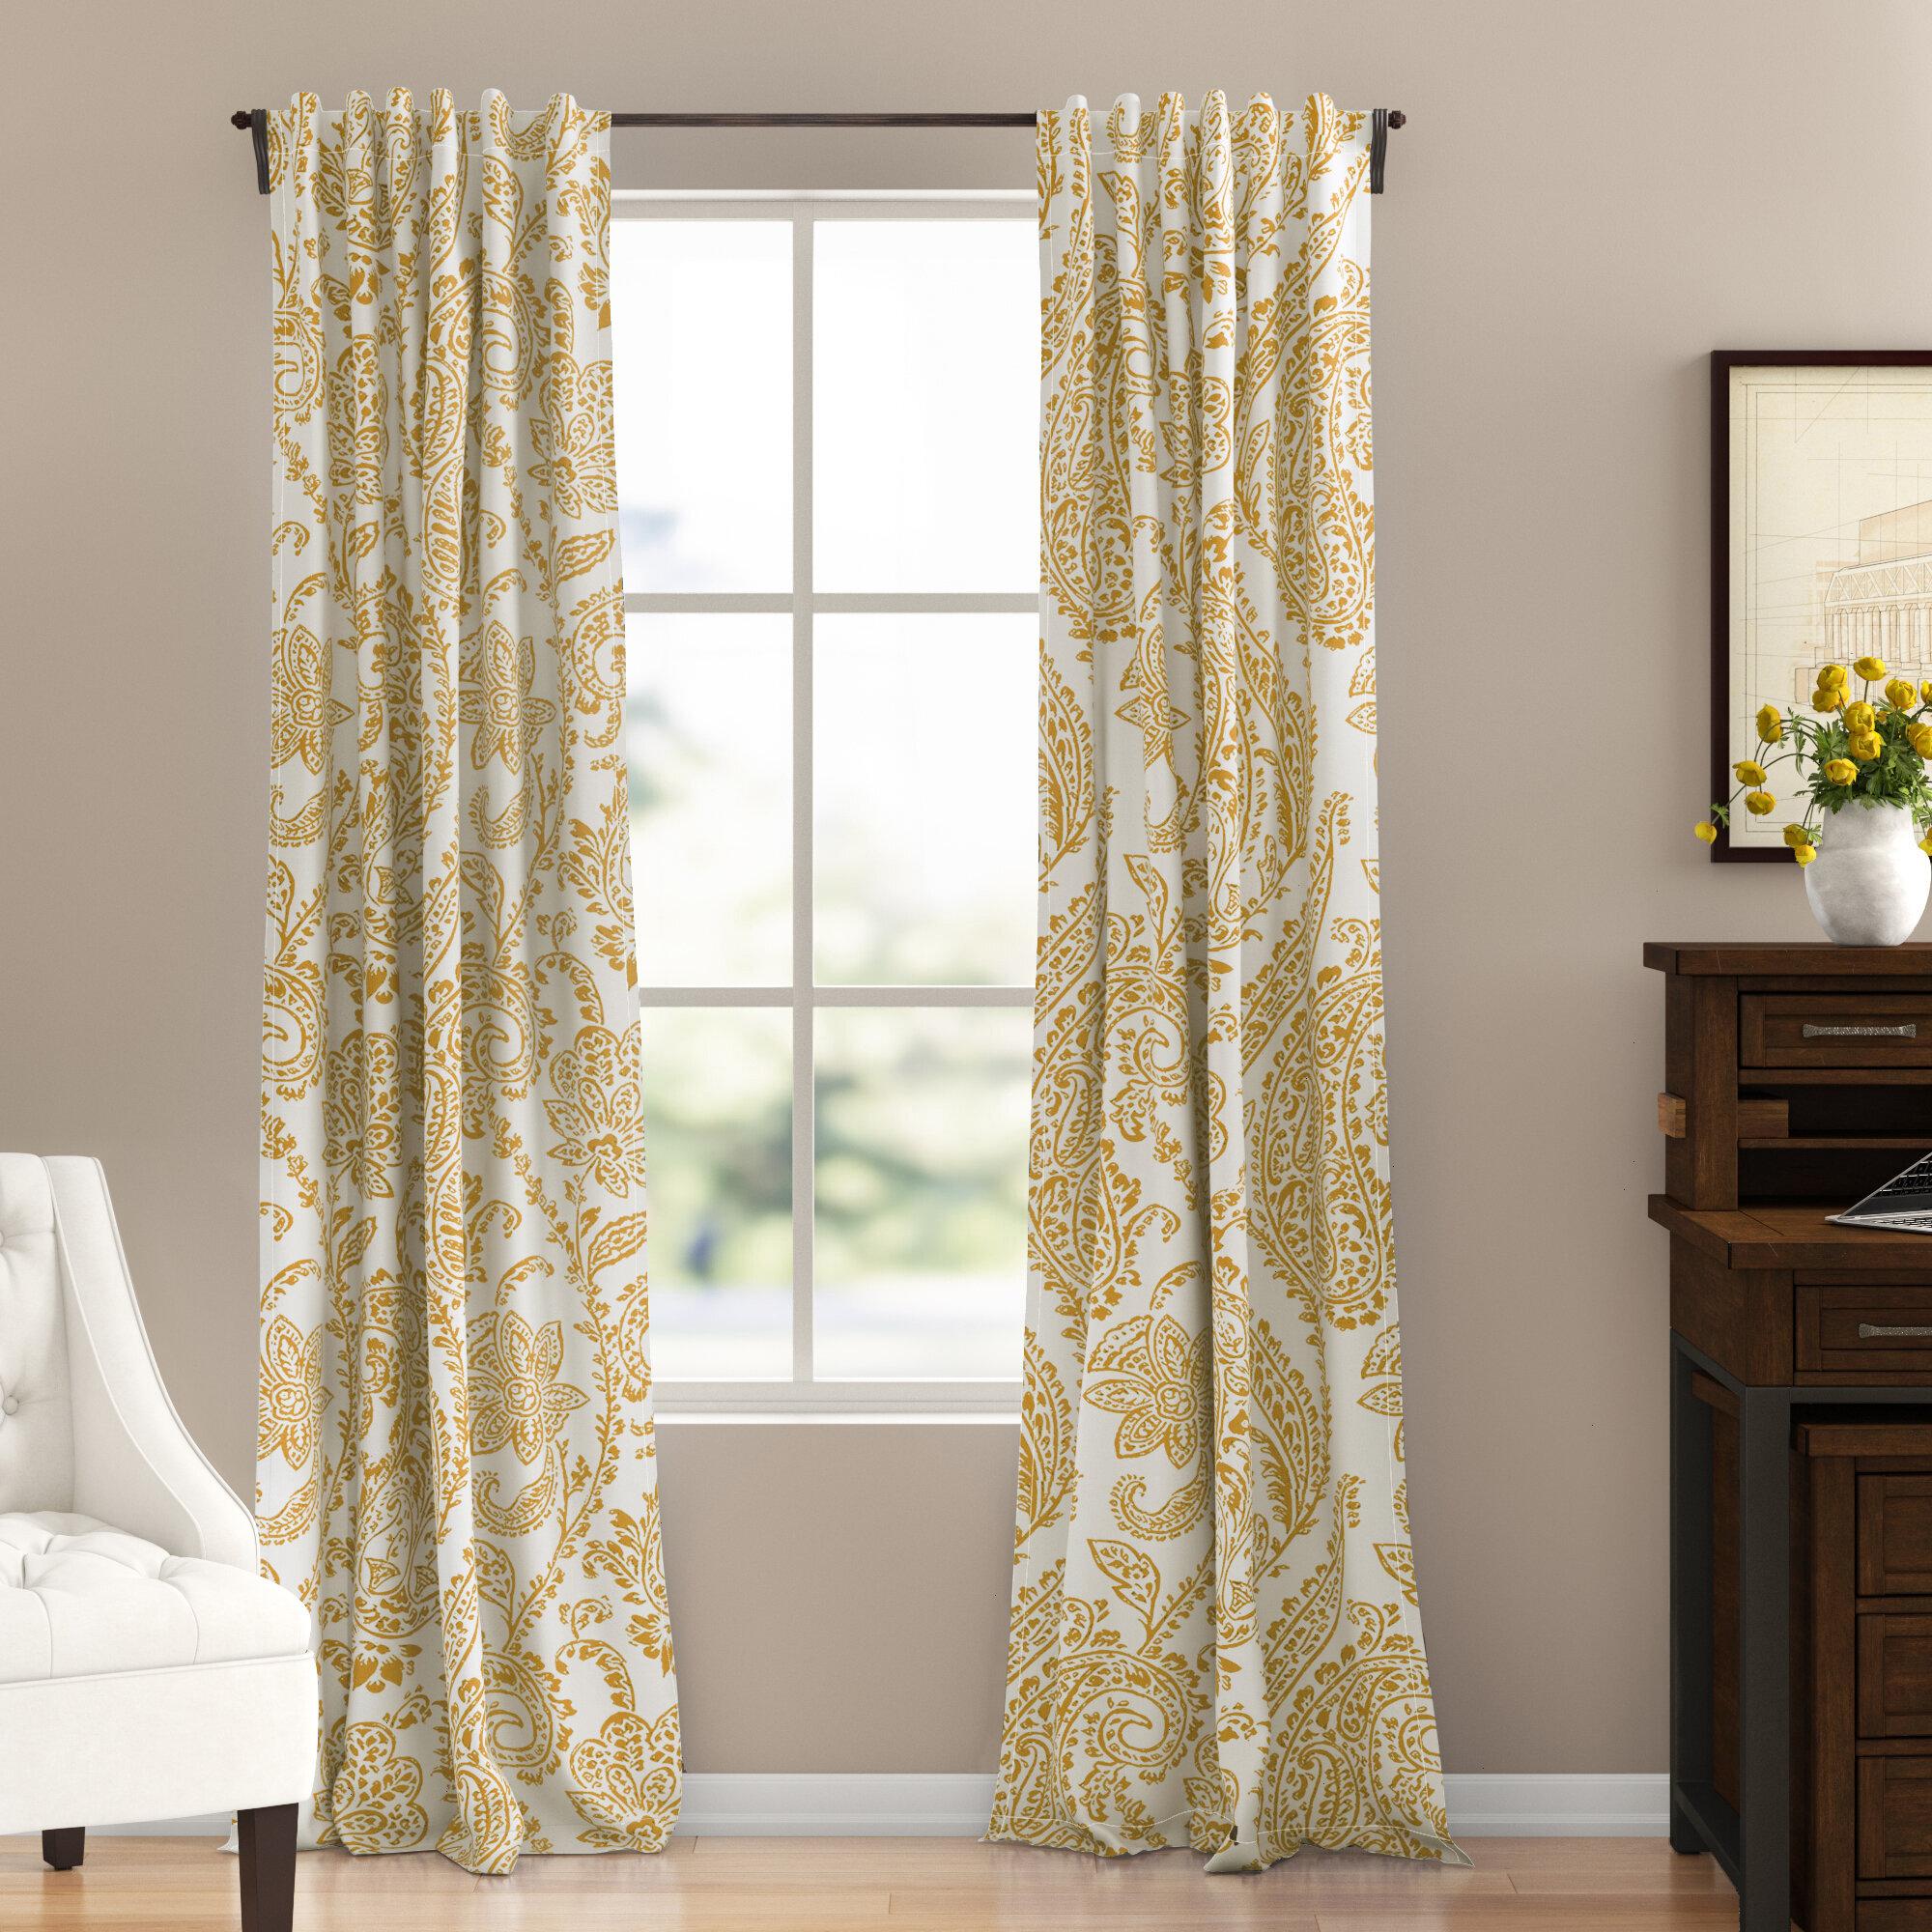 Three Posts Bryton Floral Room Darkening Rod Pocket Single Curtain Panel Reviews Wayfair,Kitchenaid Dishwasher Inside